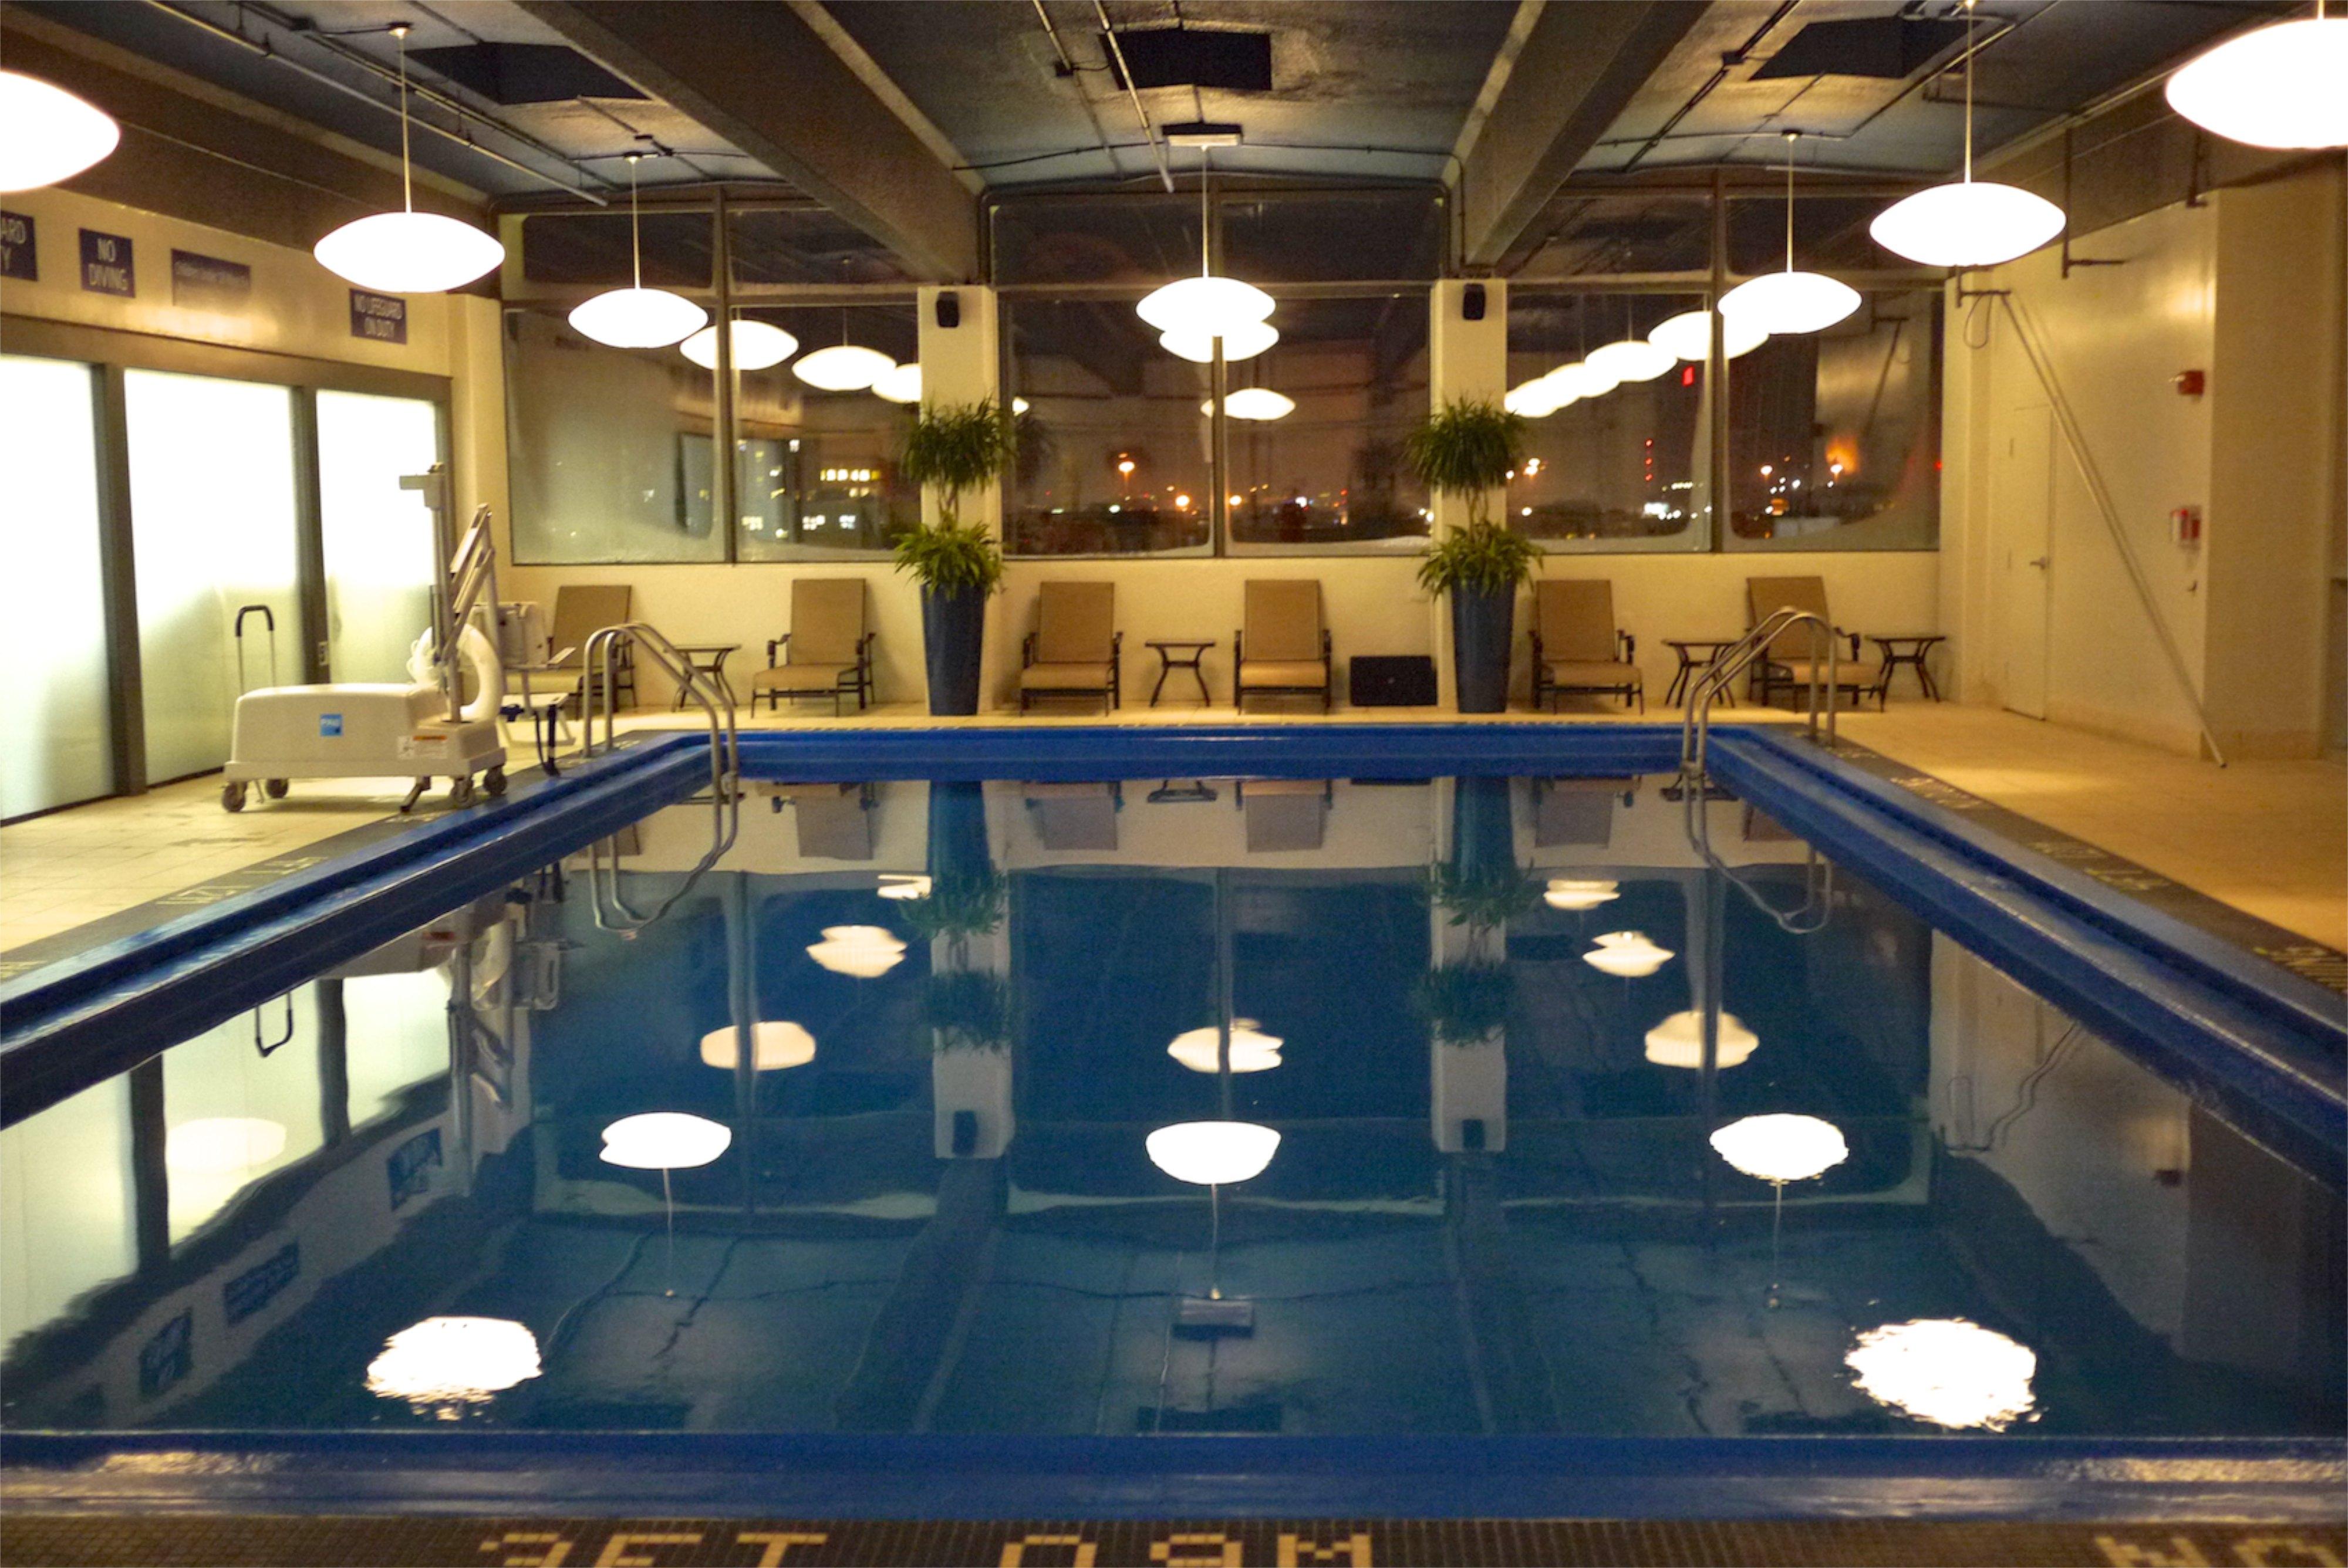 Un hôtel de luxe avec piscine: on y prend goût!